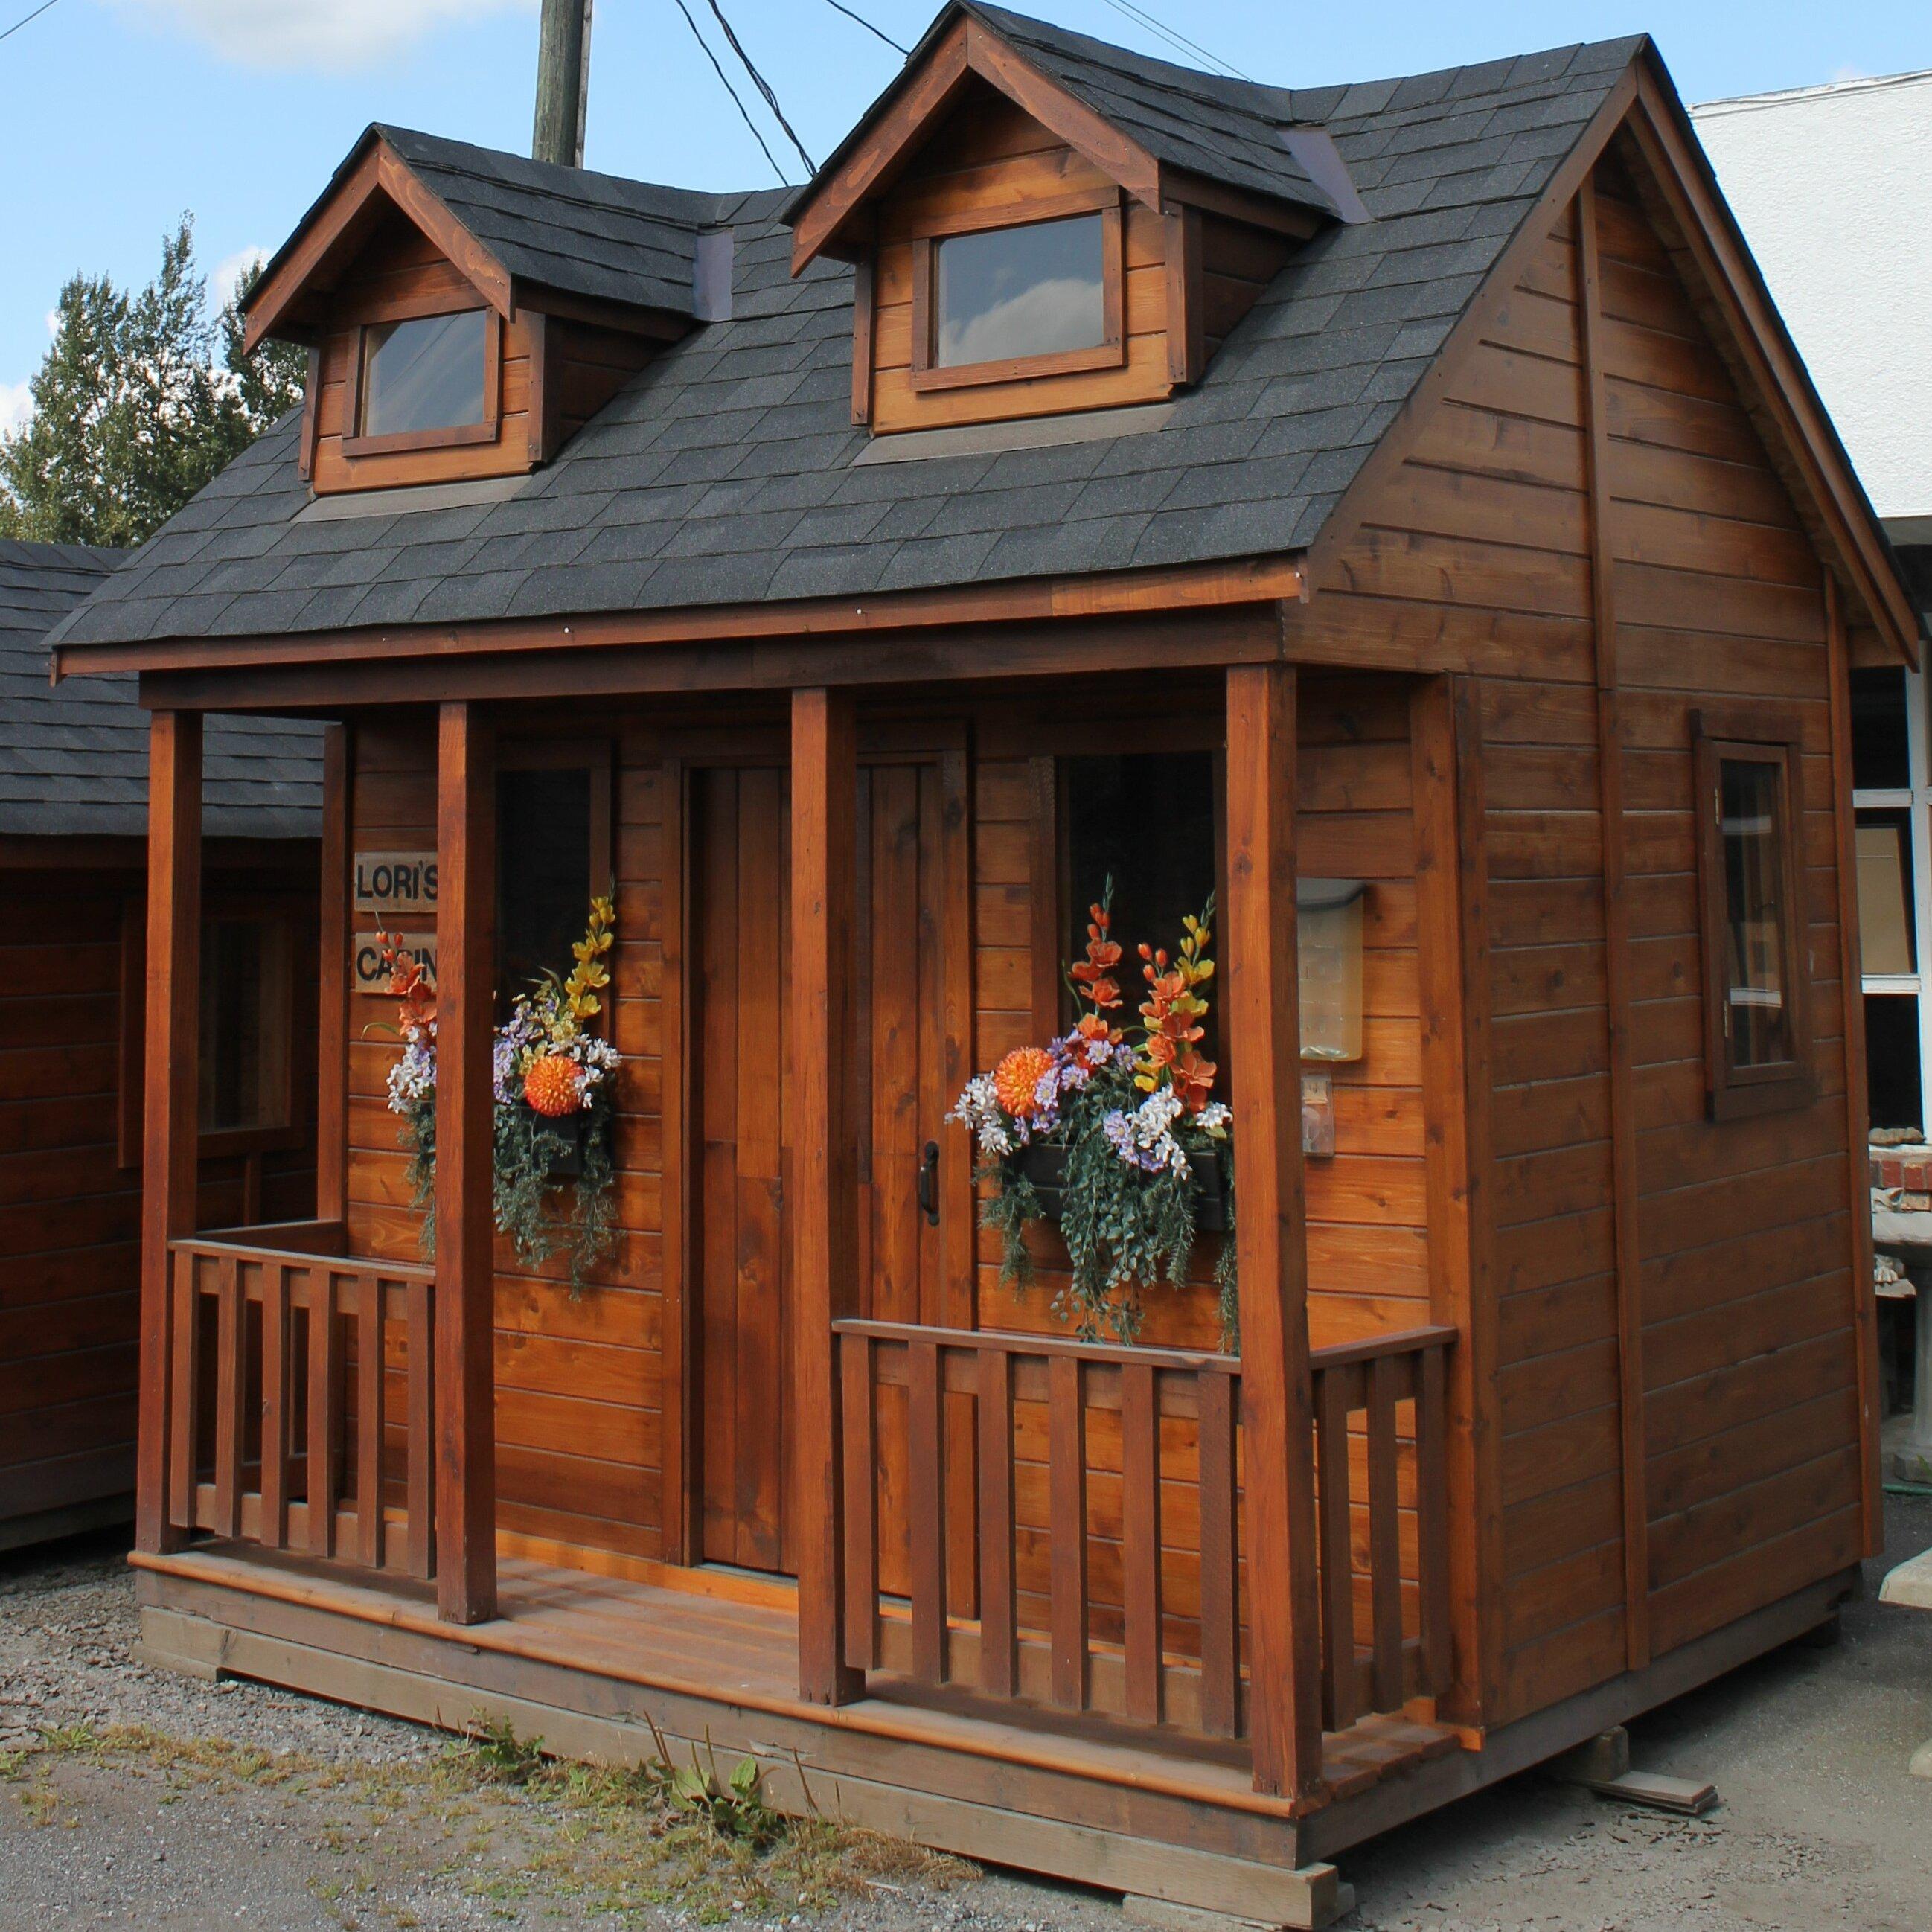 Westviewmanufacturing lori 39 s cabin playhouse wayfair for Kids cabin playhouse